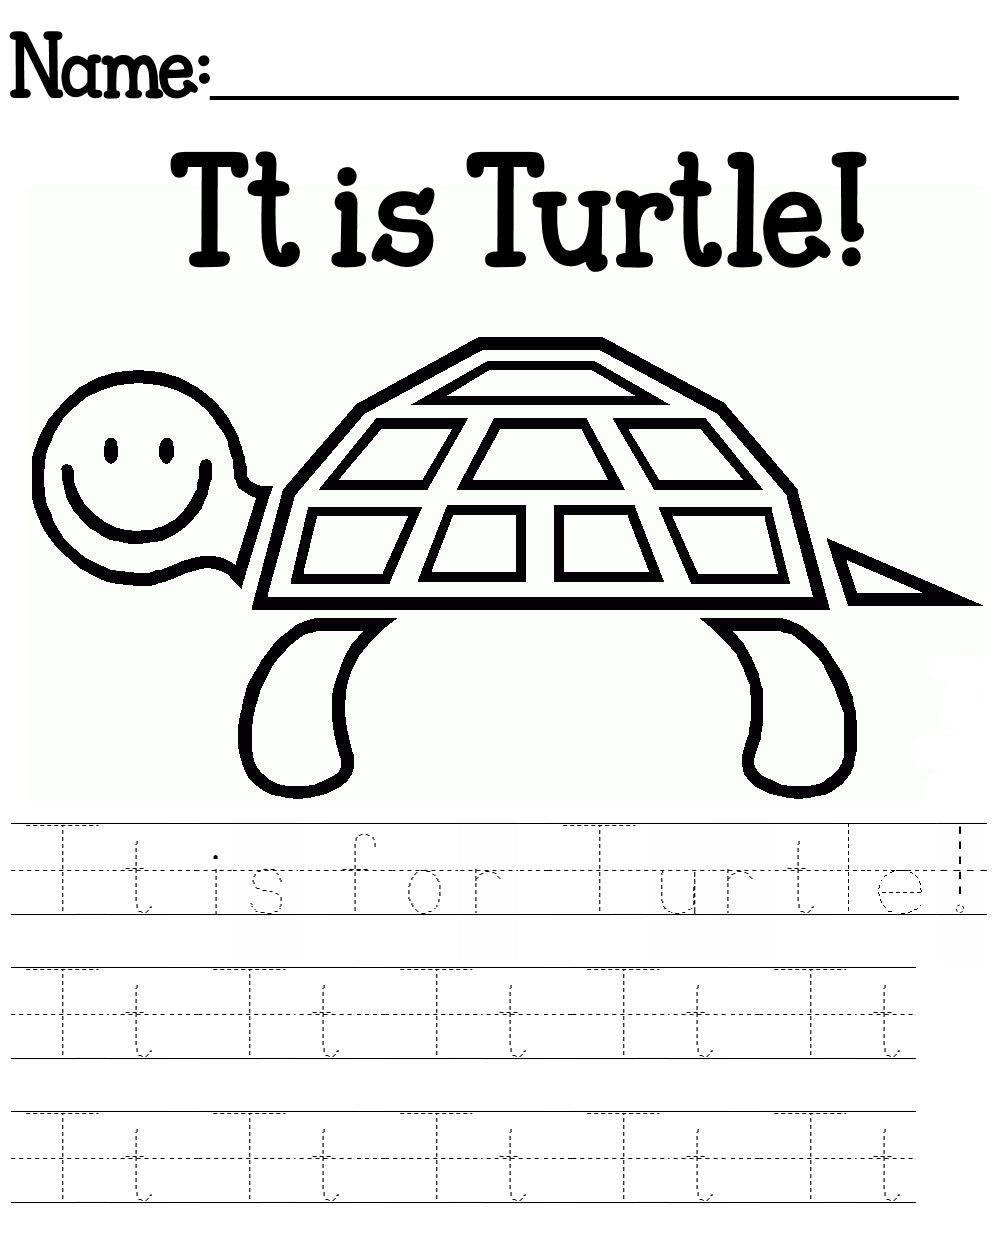 Free Yertle The Turtle Printables Mysunwillshine Com Alphabet Preschool Franklin Books Turtle